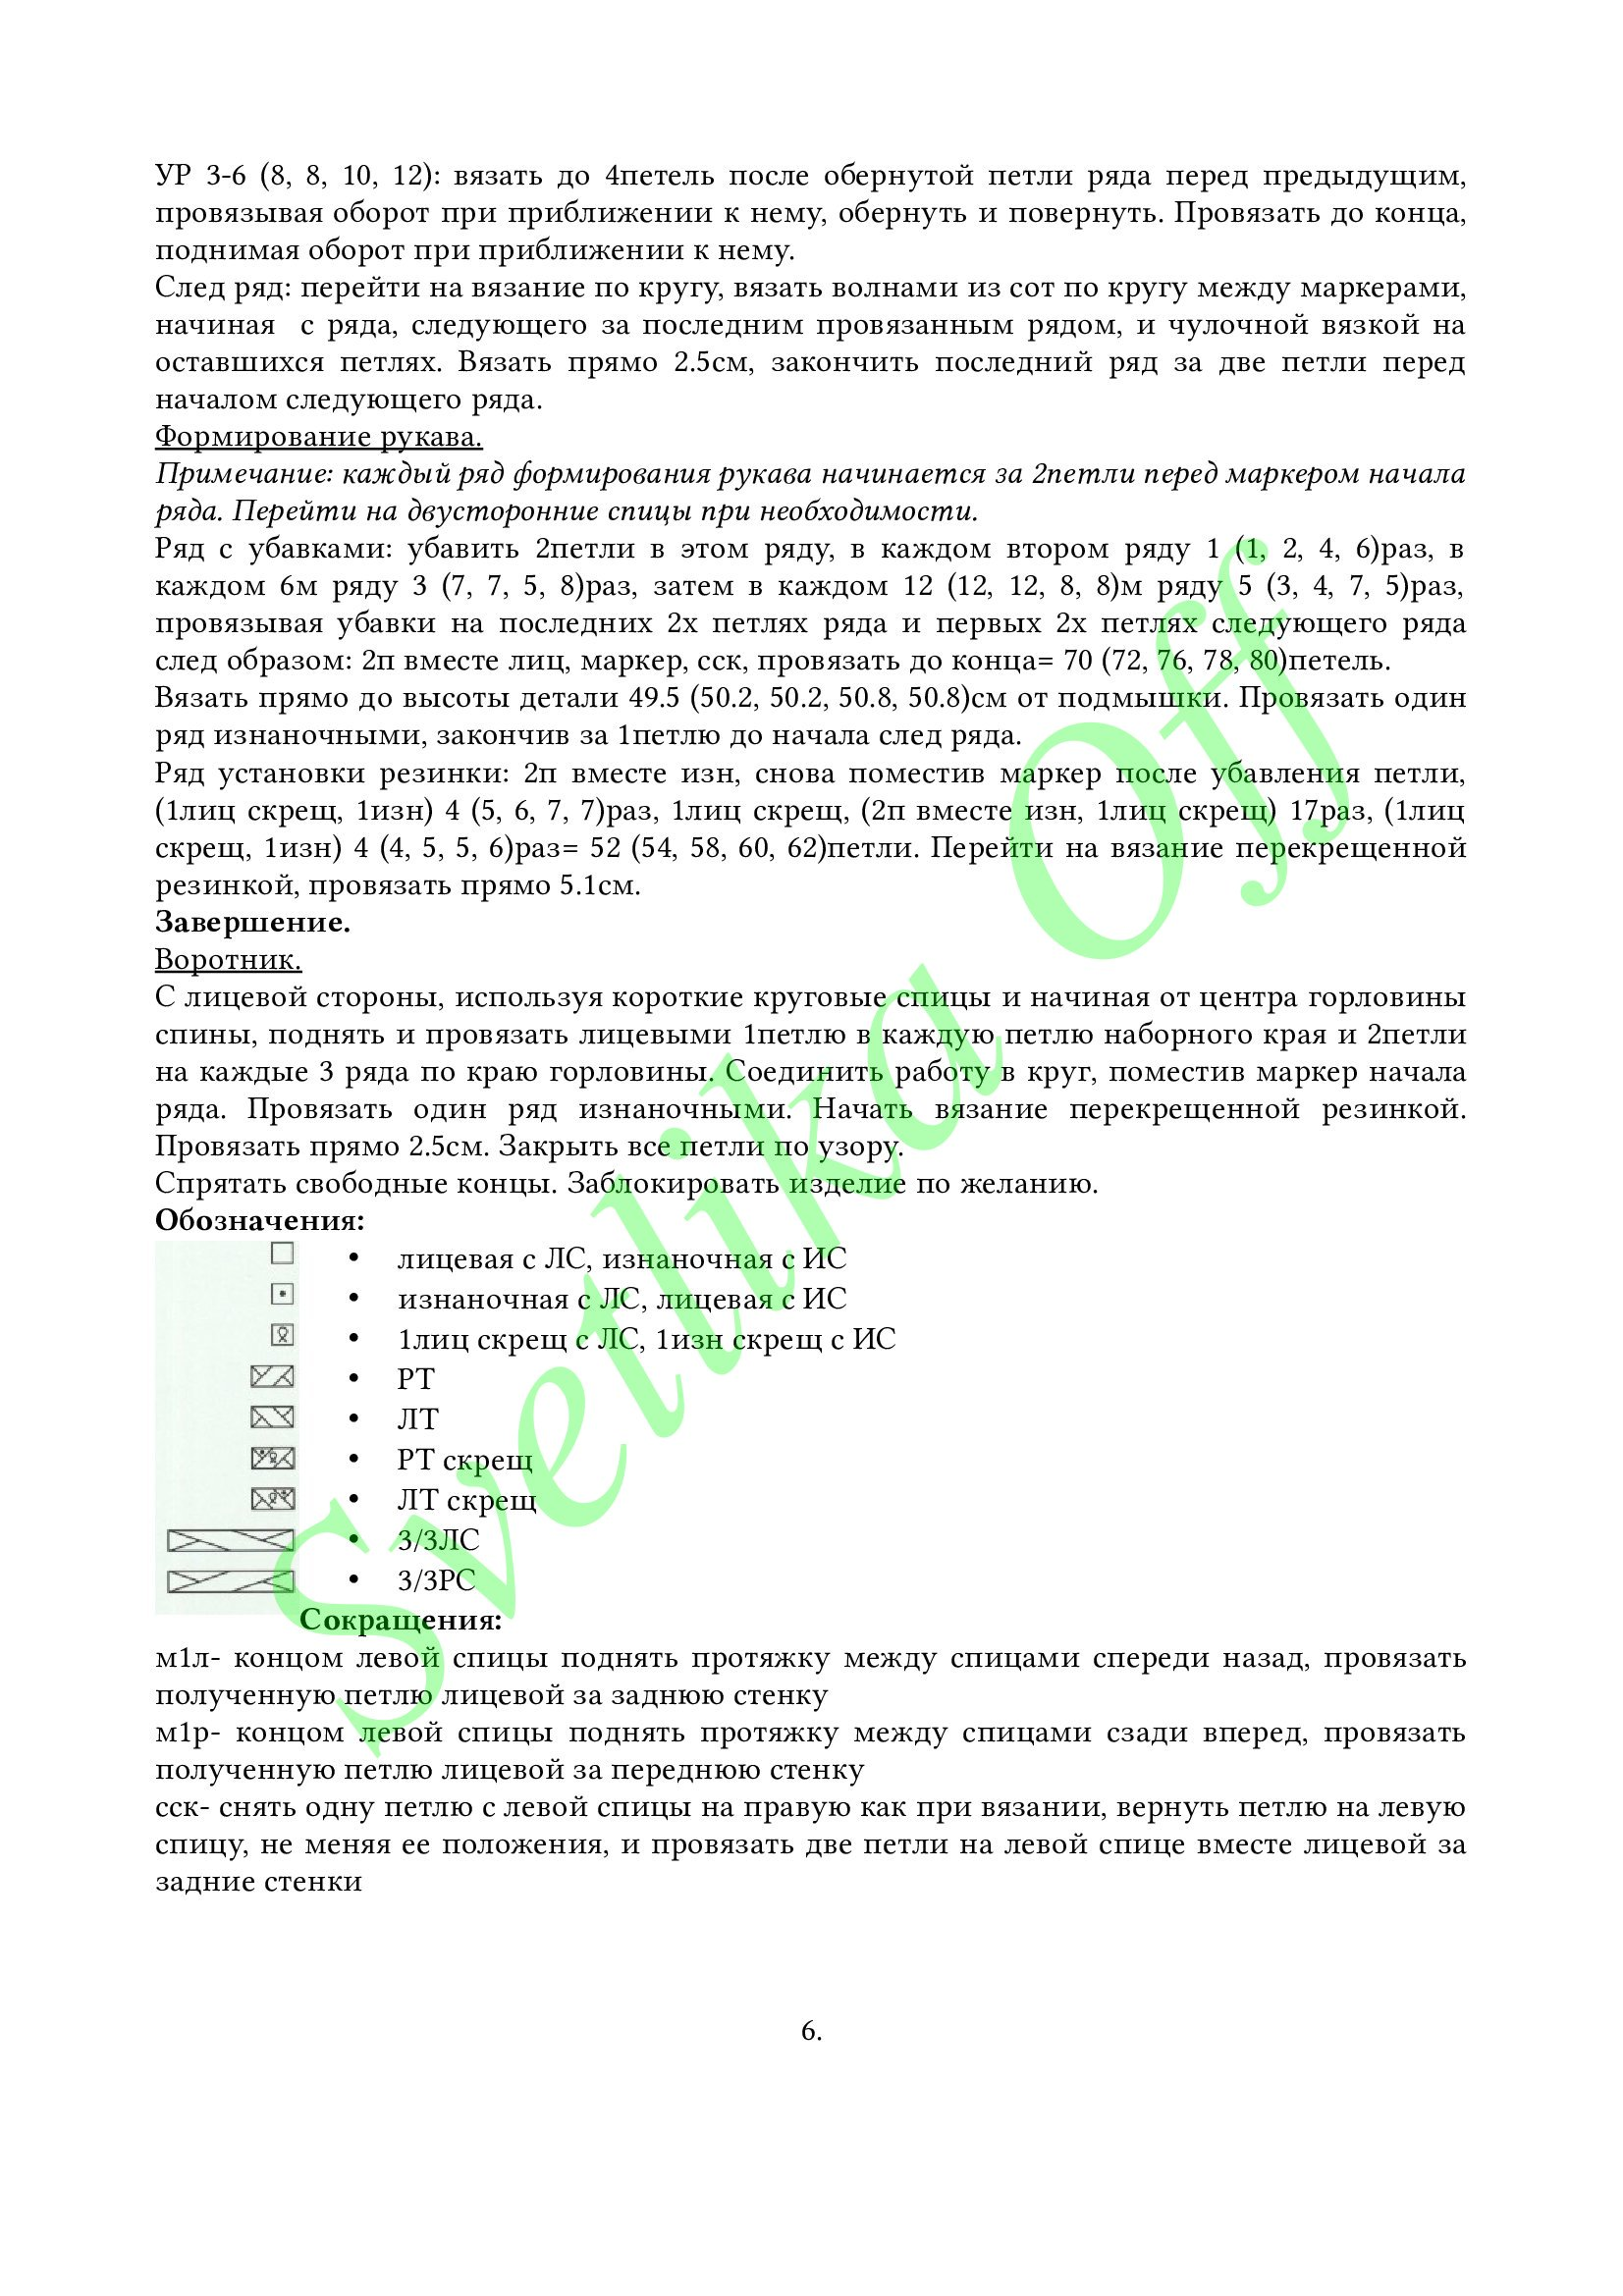 https://img-fotki.yandex.ru/get/52325/125862467.7a/0_1819ae_f1ba55e7_orig